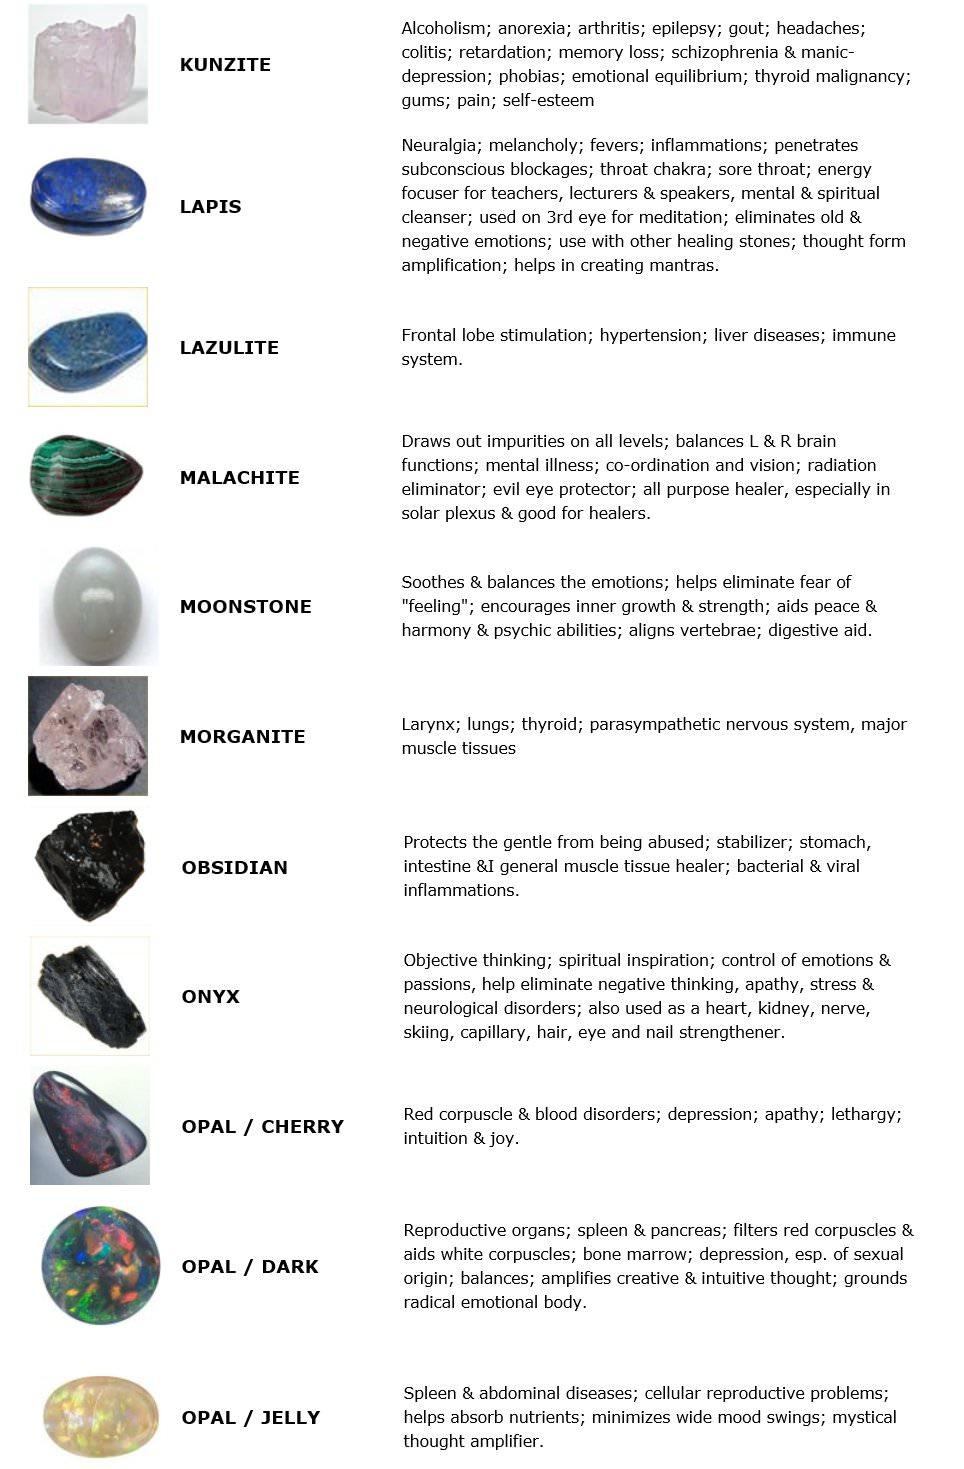 Healing Properties Of St Johns Wort